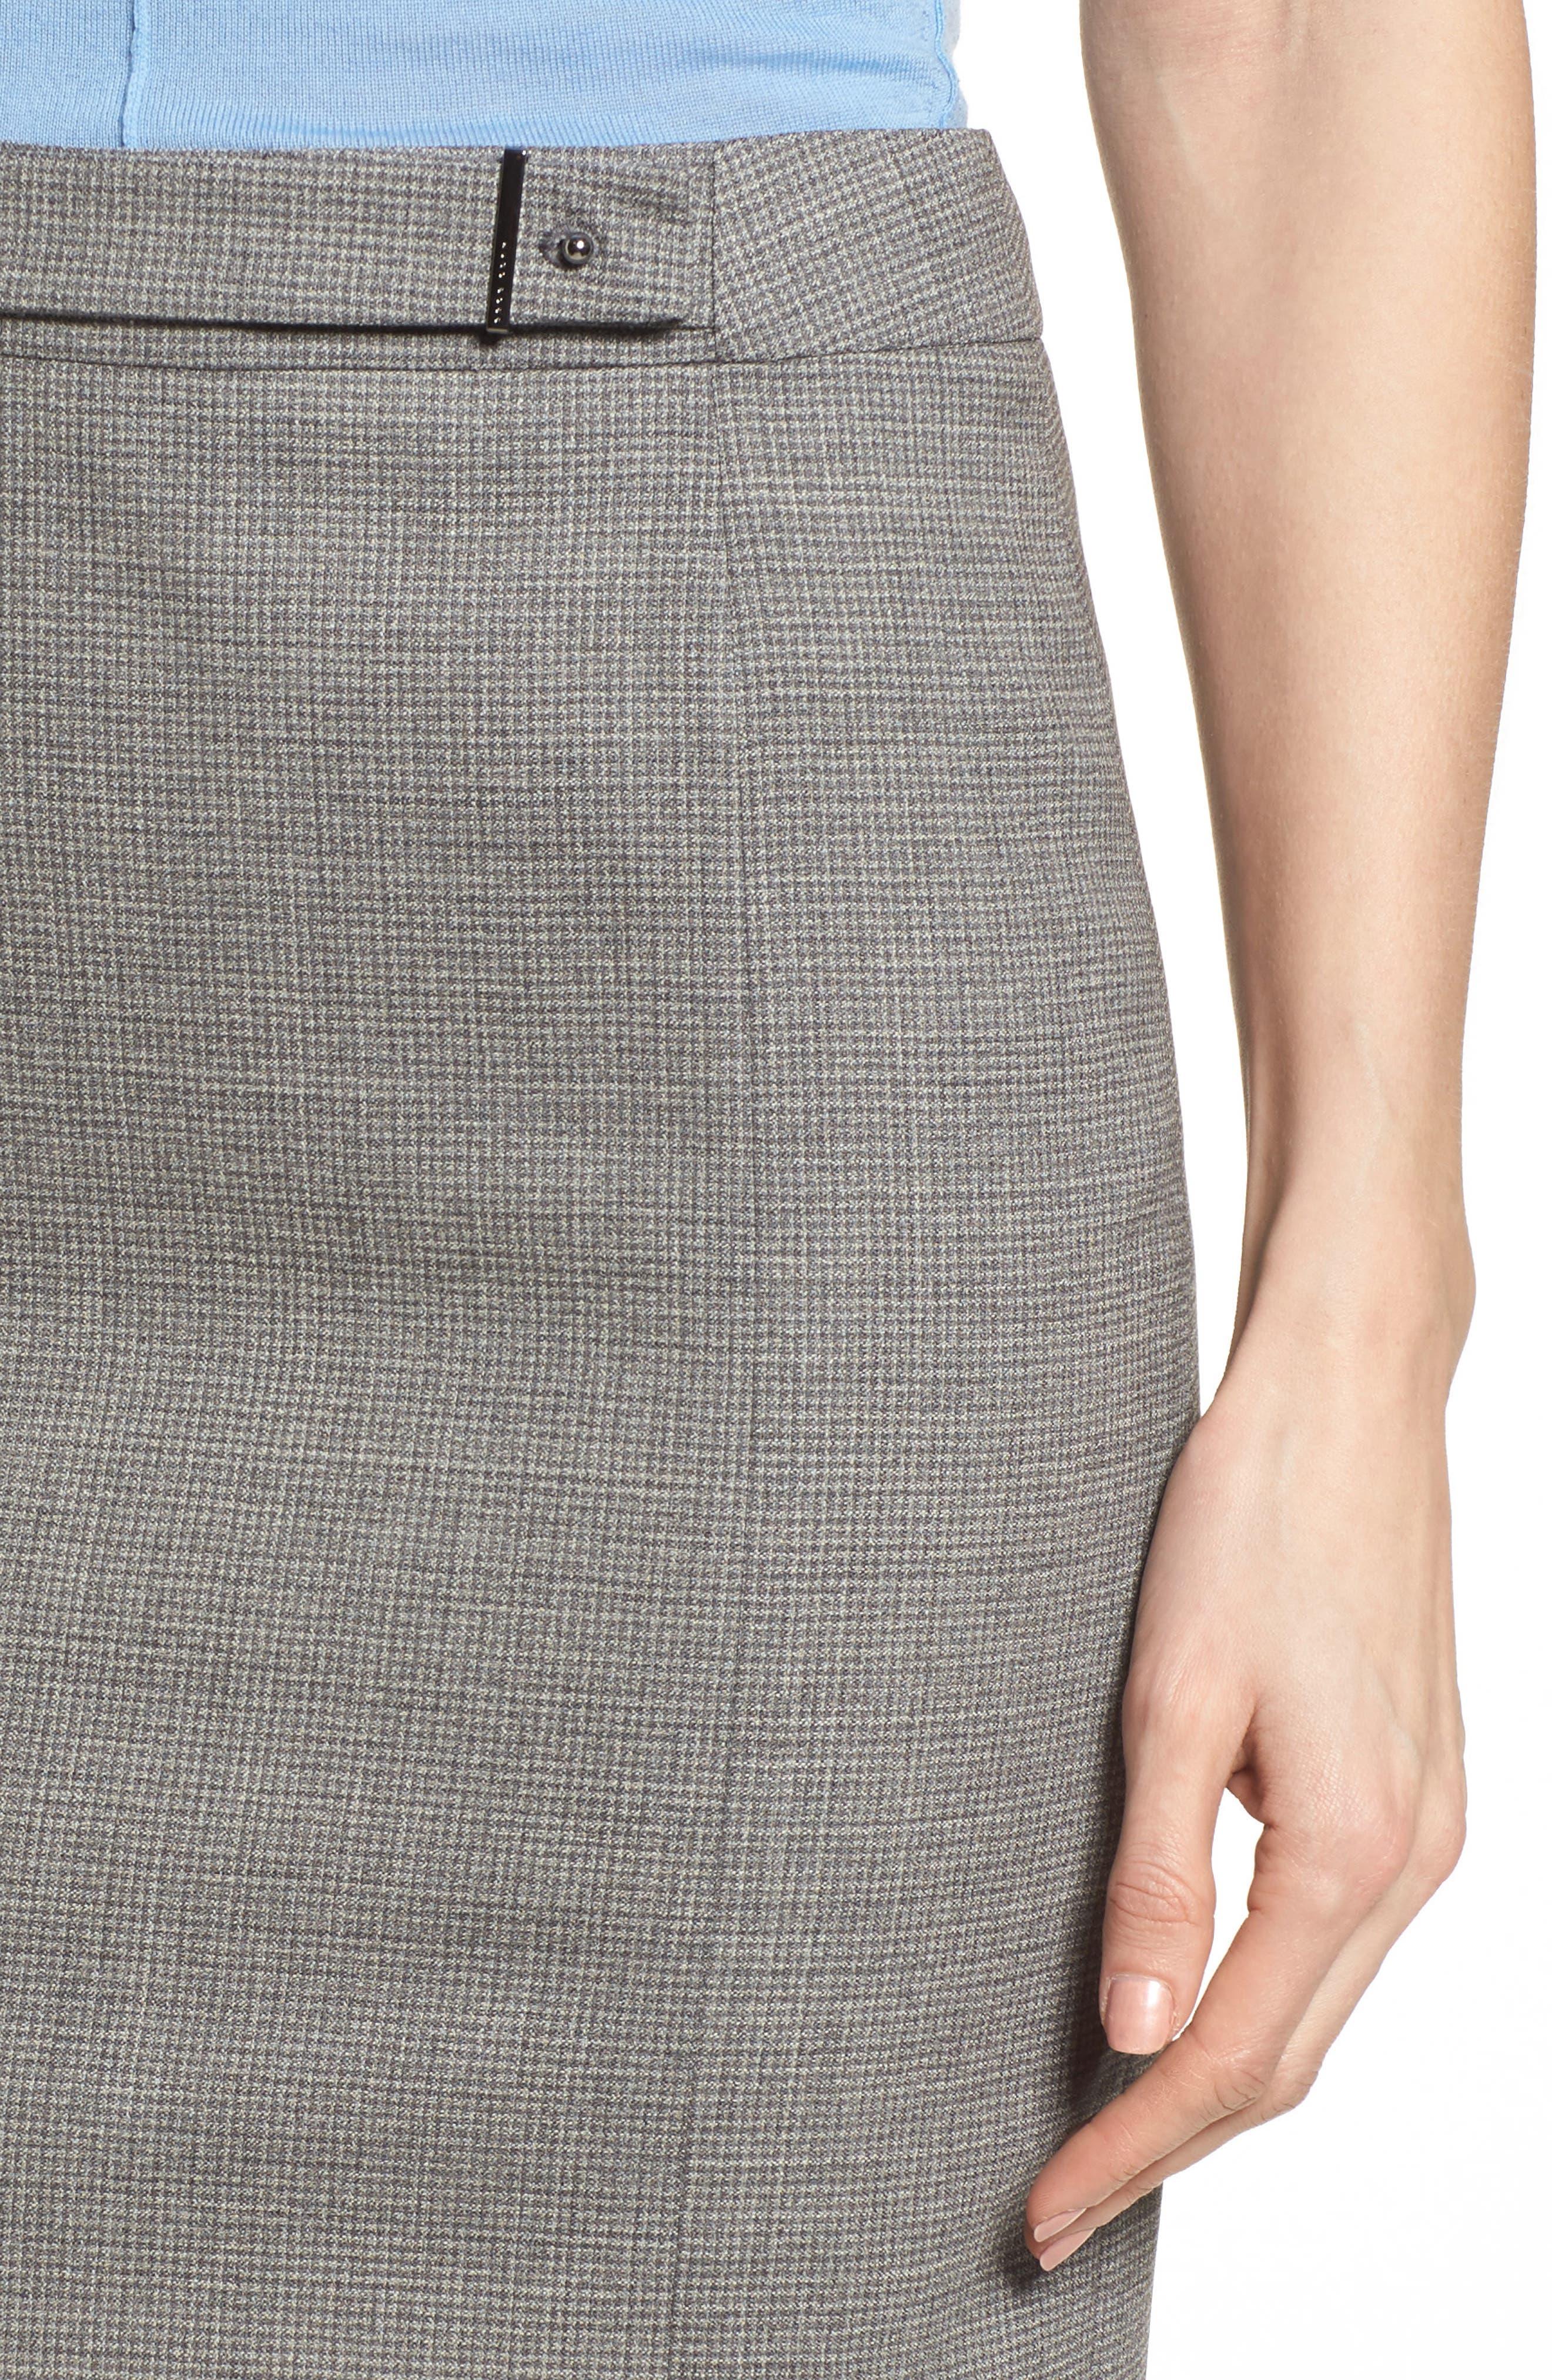 Vewisa Check Wool Suit Skirt,                             Alternate thumbnail 4, color,                             Cozy Grey Melange Fantasy